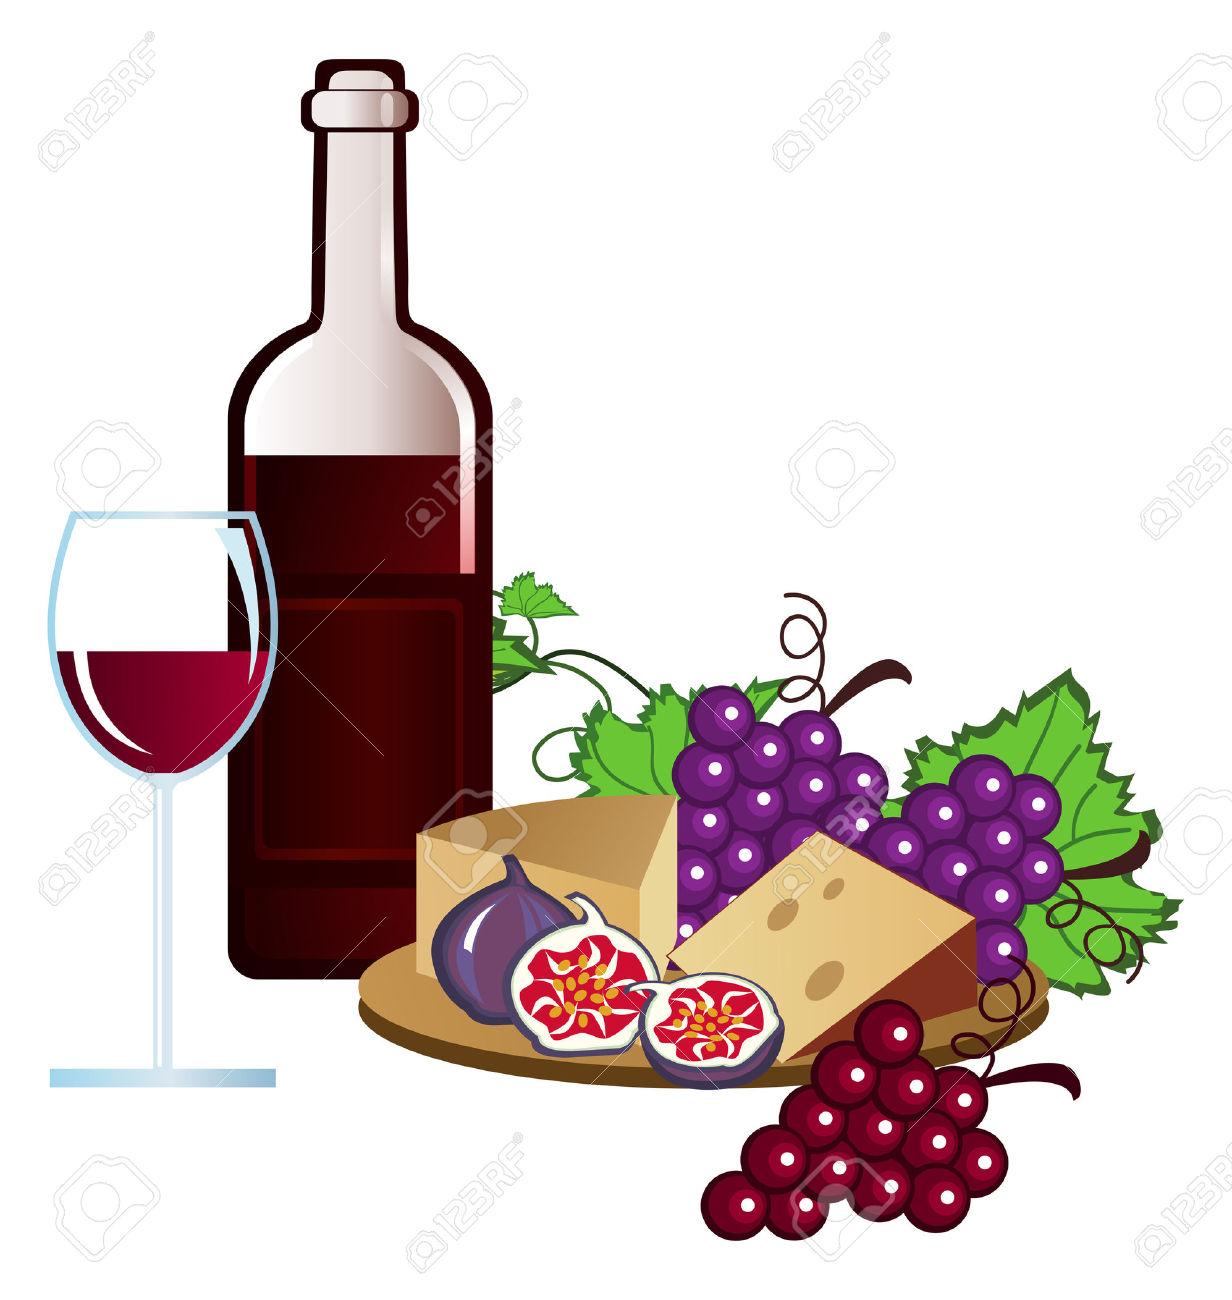 Celebration clipart wine, Celebration wine Transparent FREE.